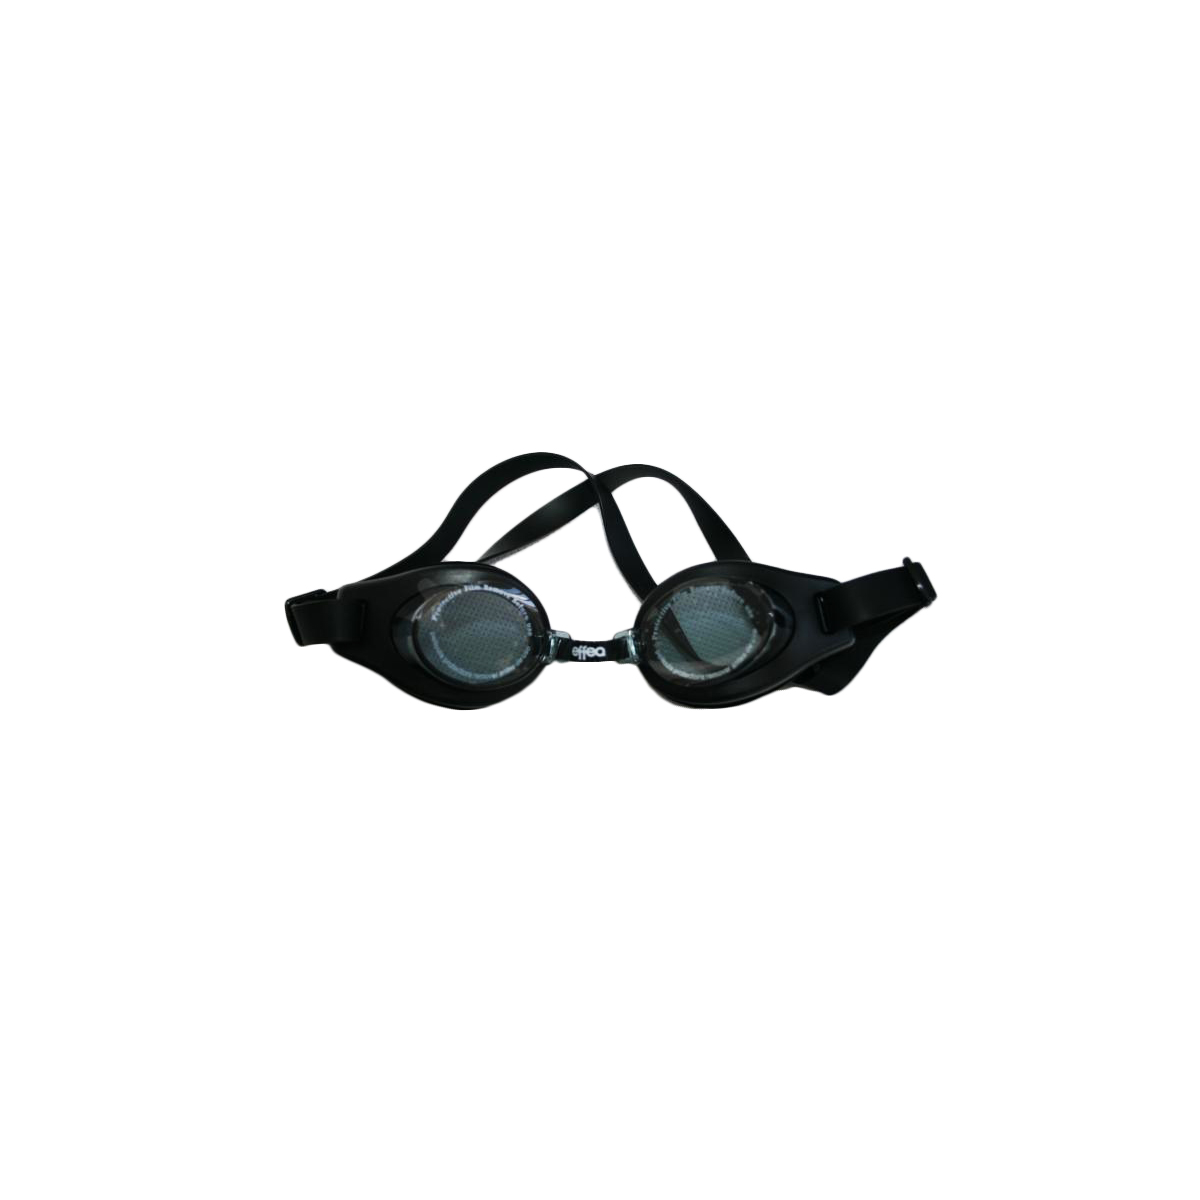 Plavecké brýle EFFEA 2620 junior